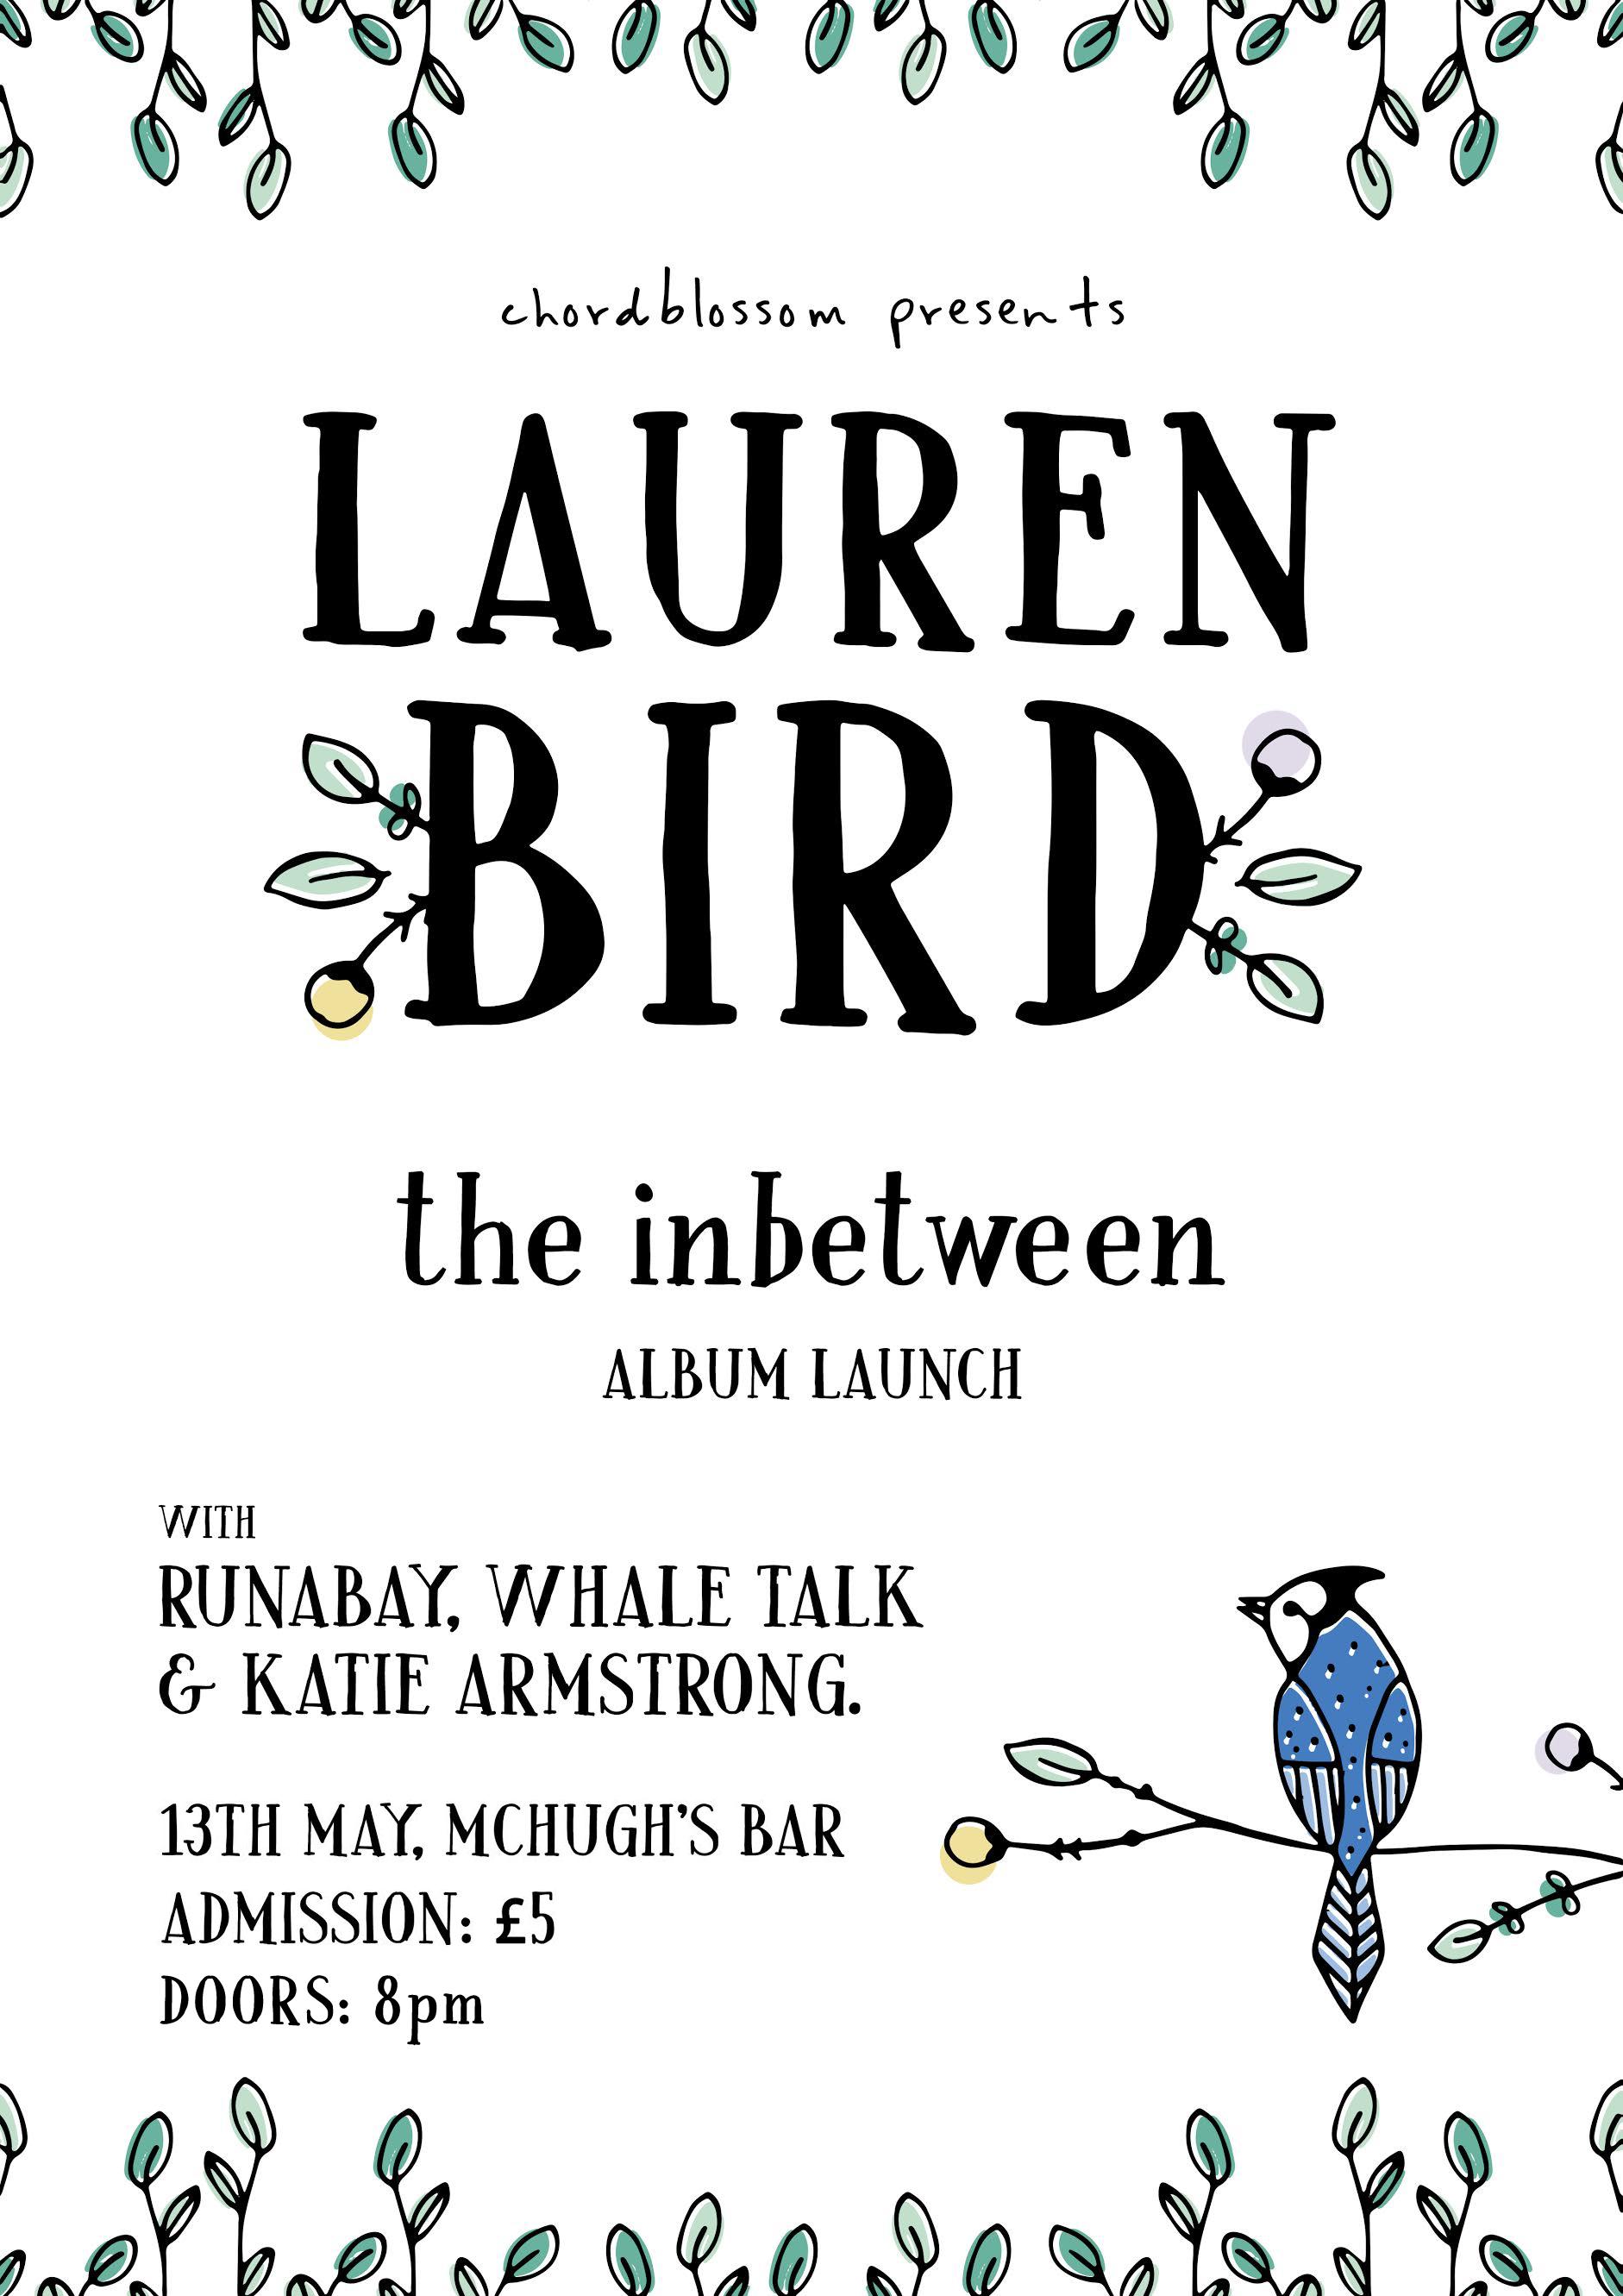 Lauren Bird The Inbetween Album Launch Chordblossom